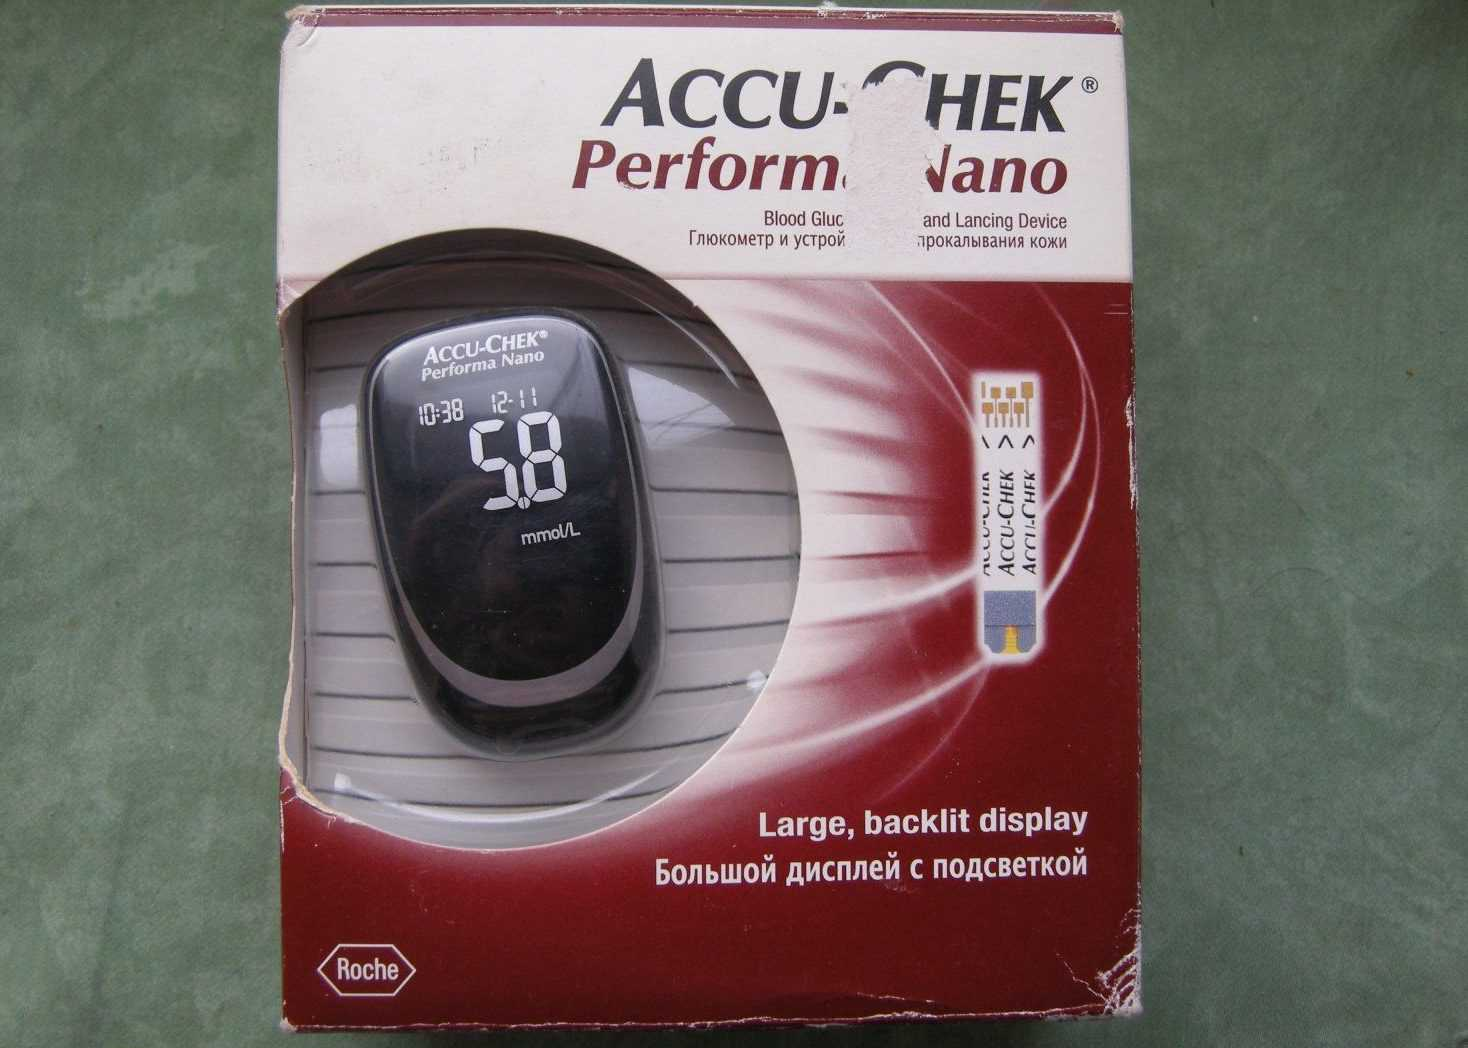 глюкометр Акку-Чер перформа нано